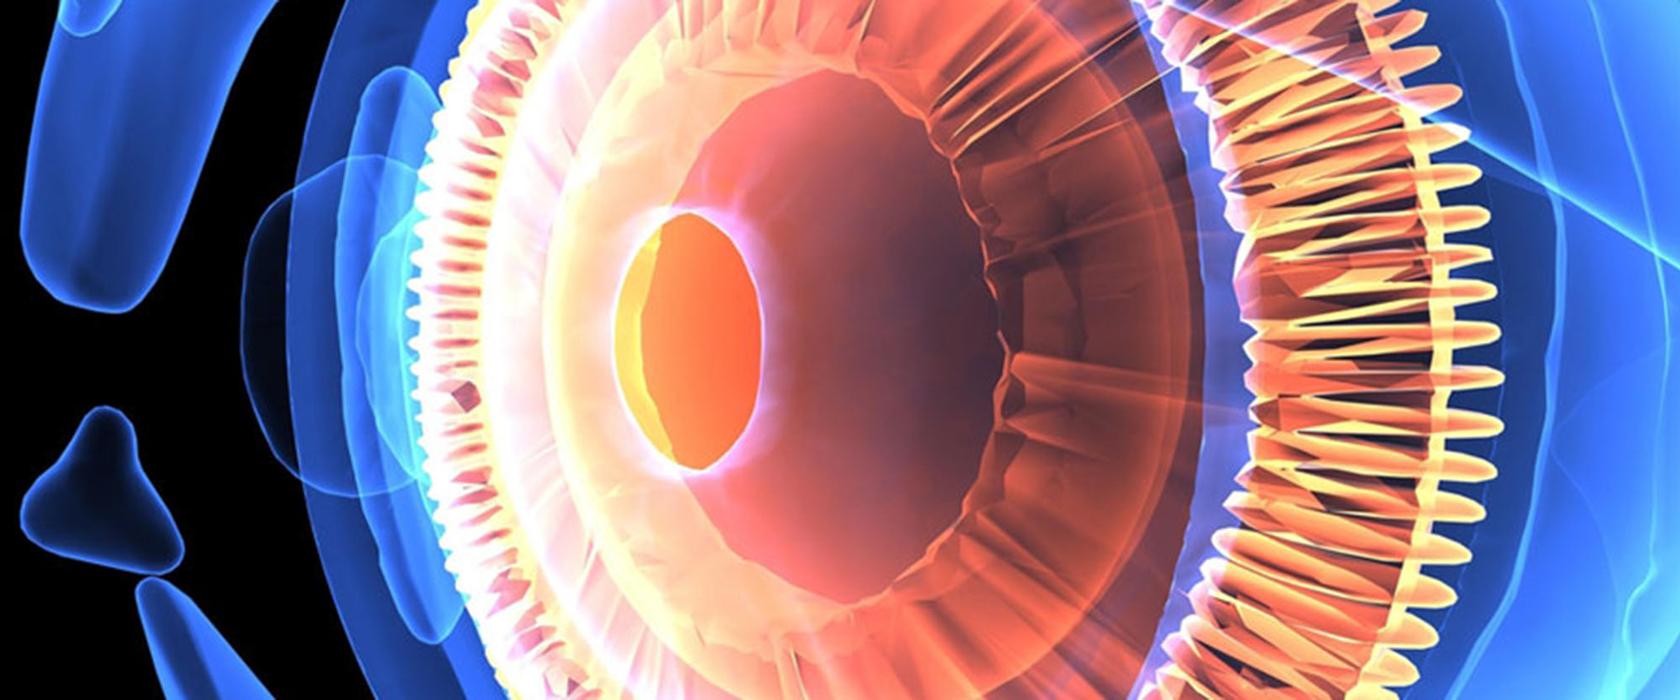 Описание глаз человека красиво